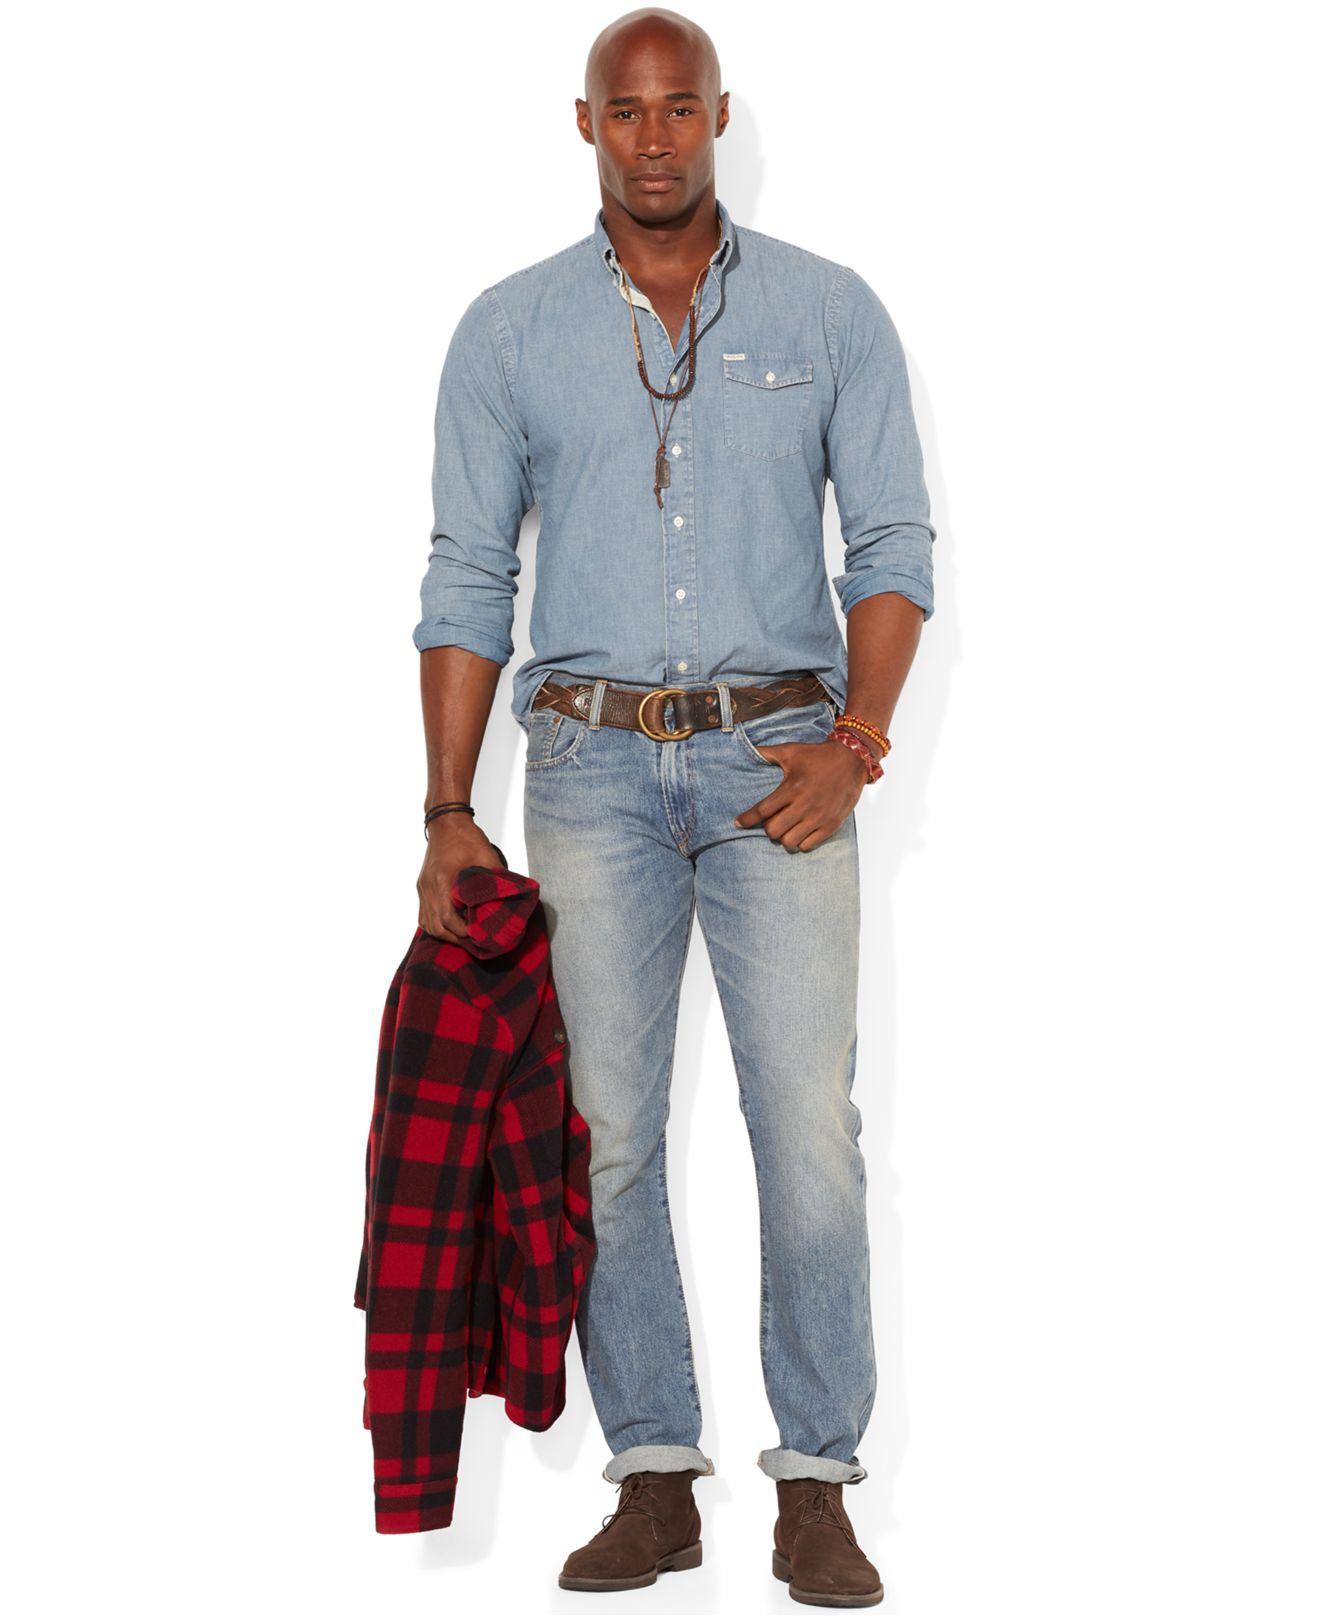 767e2906b2 Big Tall Mens Denim Shirts